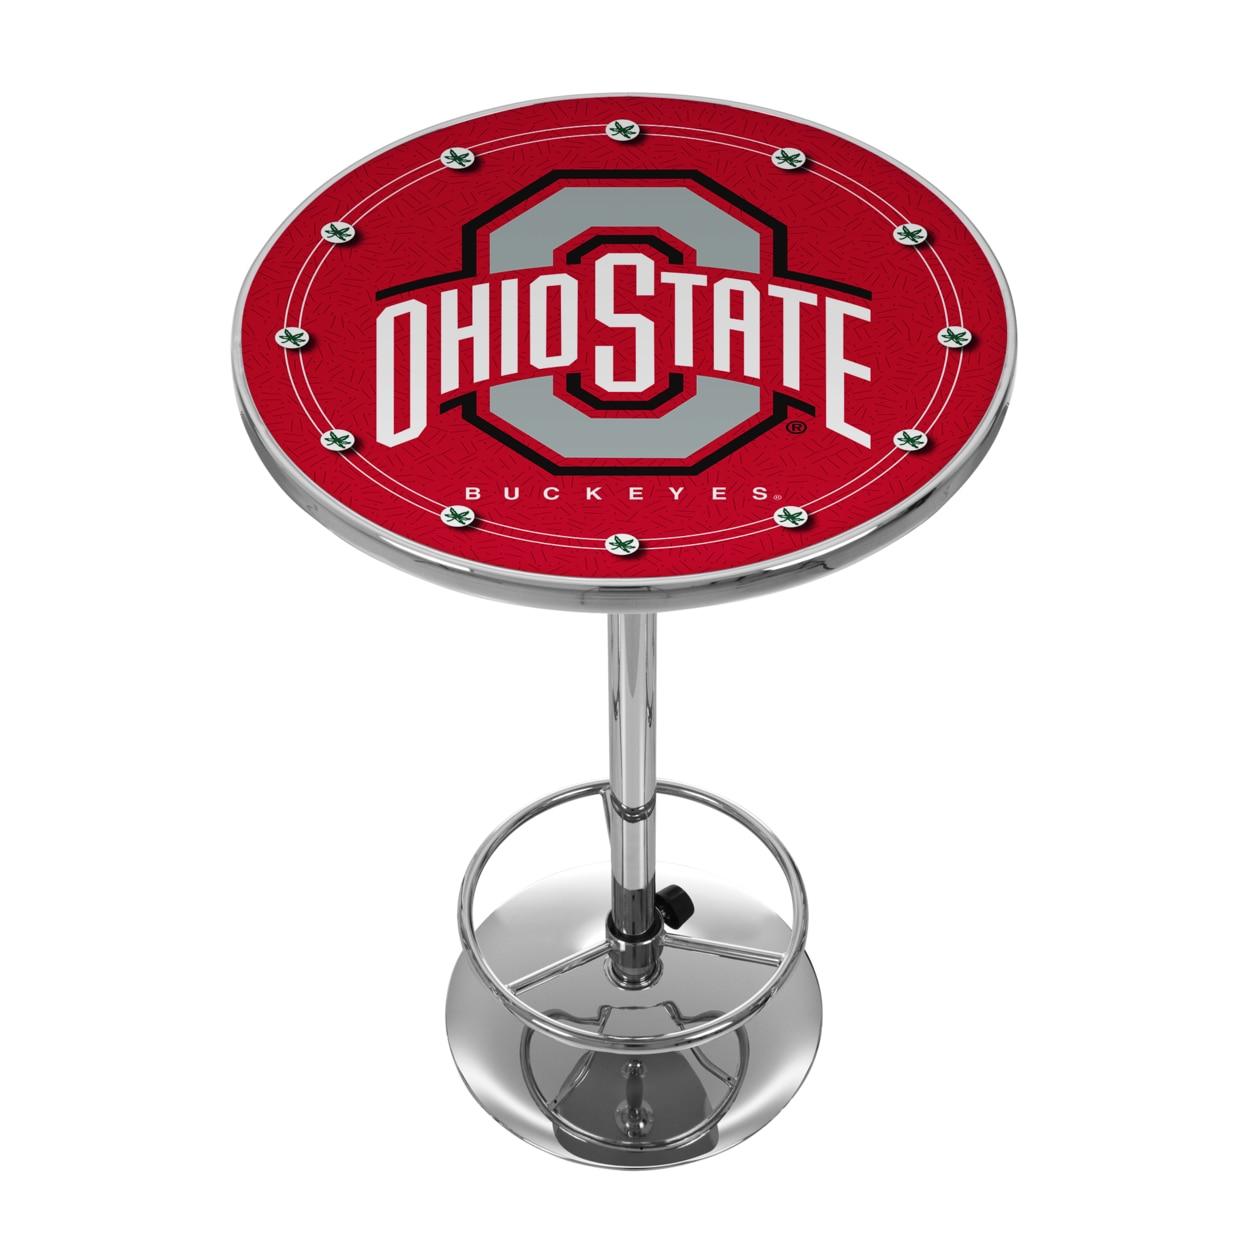 The Ohio State University 42 Inch Pub Table ботинки meindl meindl ohio 2 gtx® женские